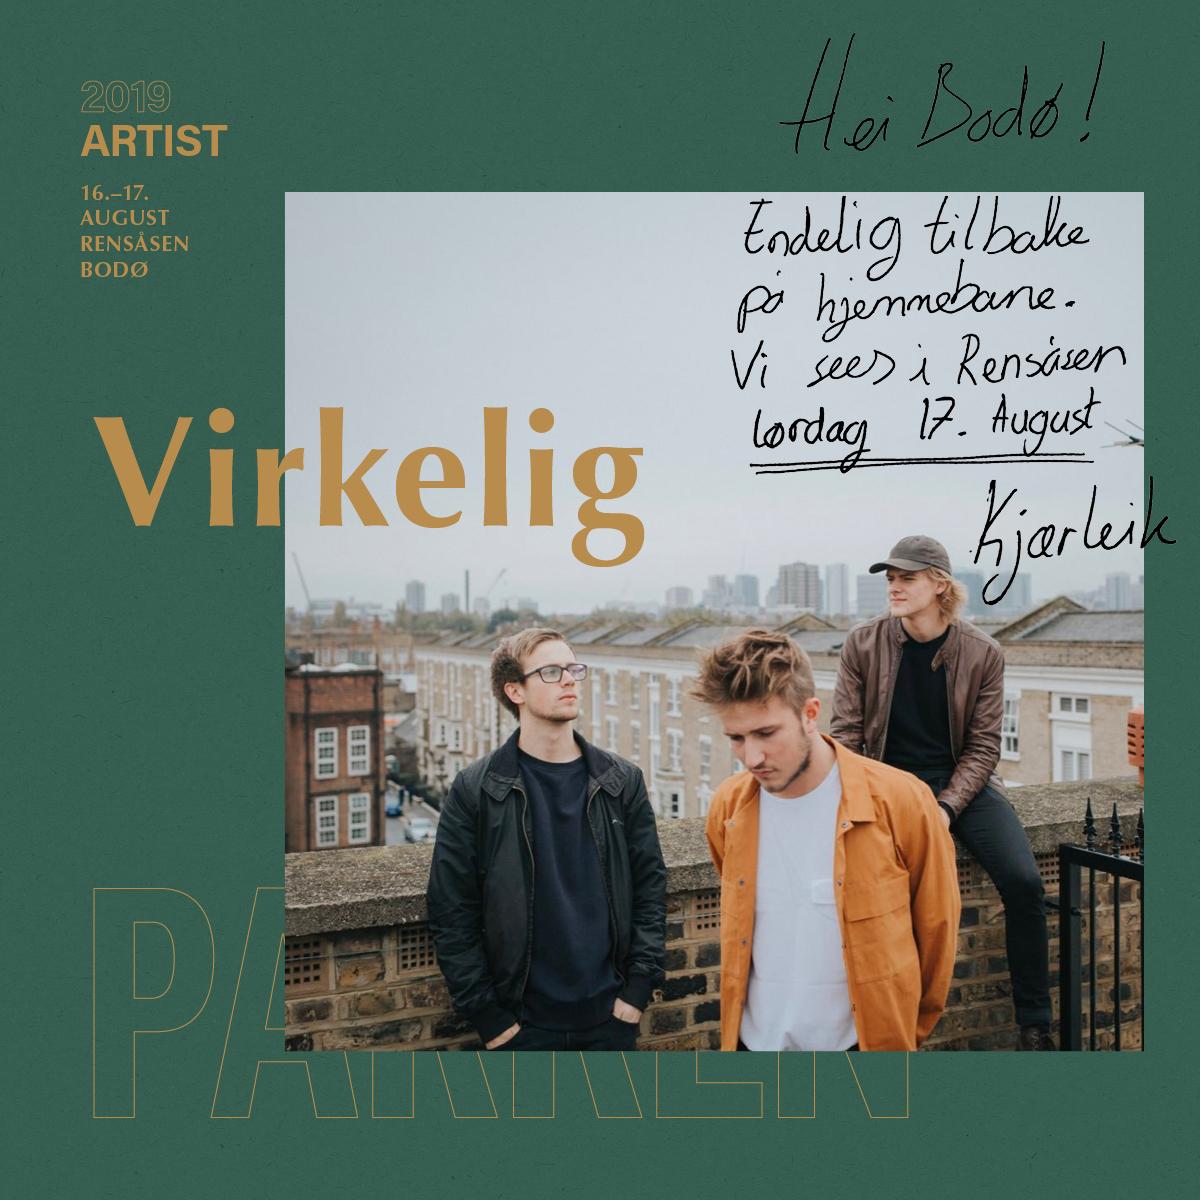 BYRAA_Parken_2019_Artistslipp_Virkelig_1200x1200px.jpg